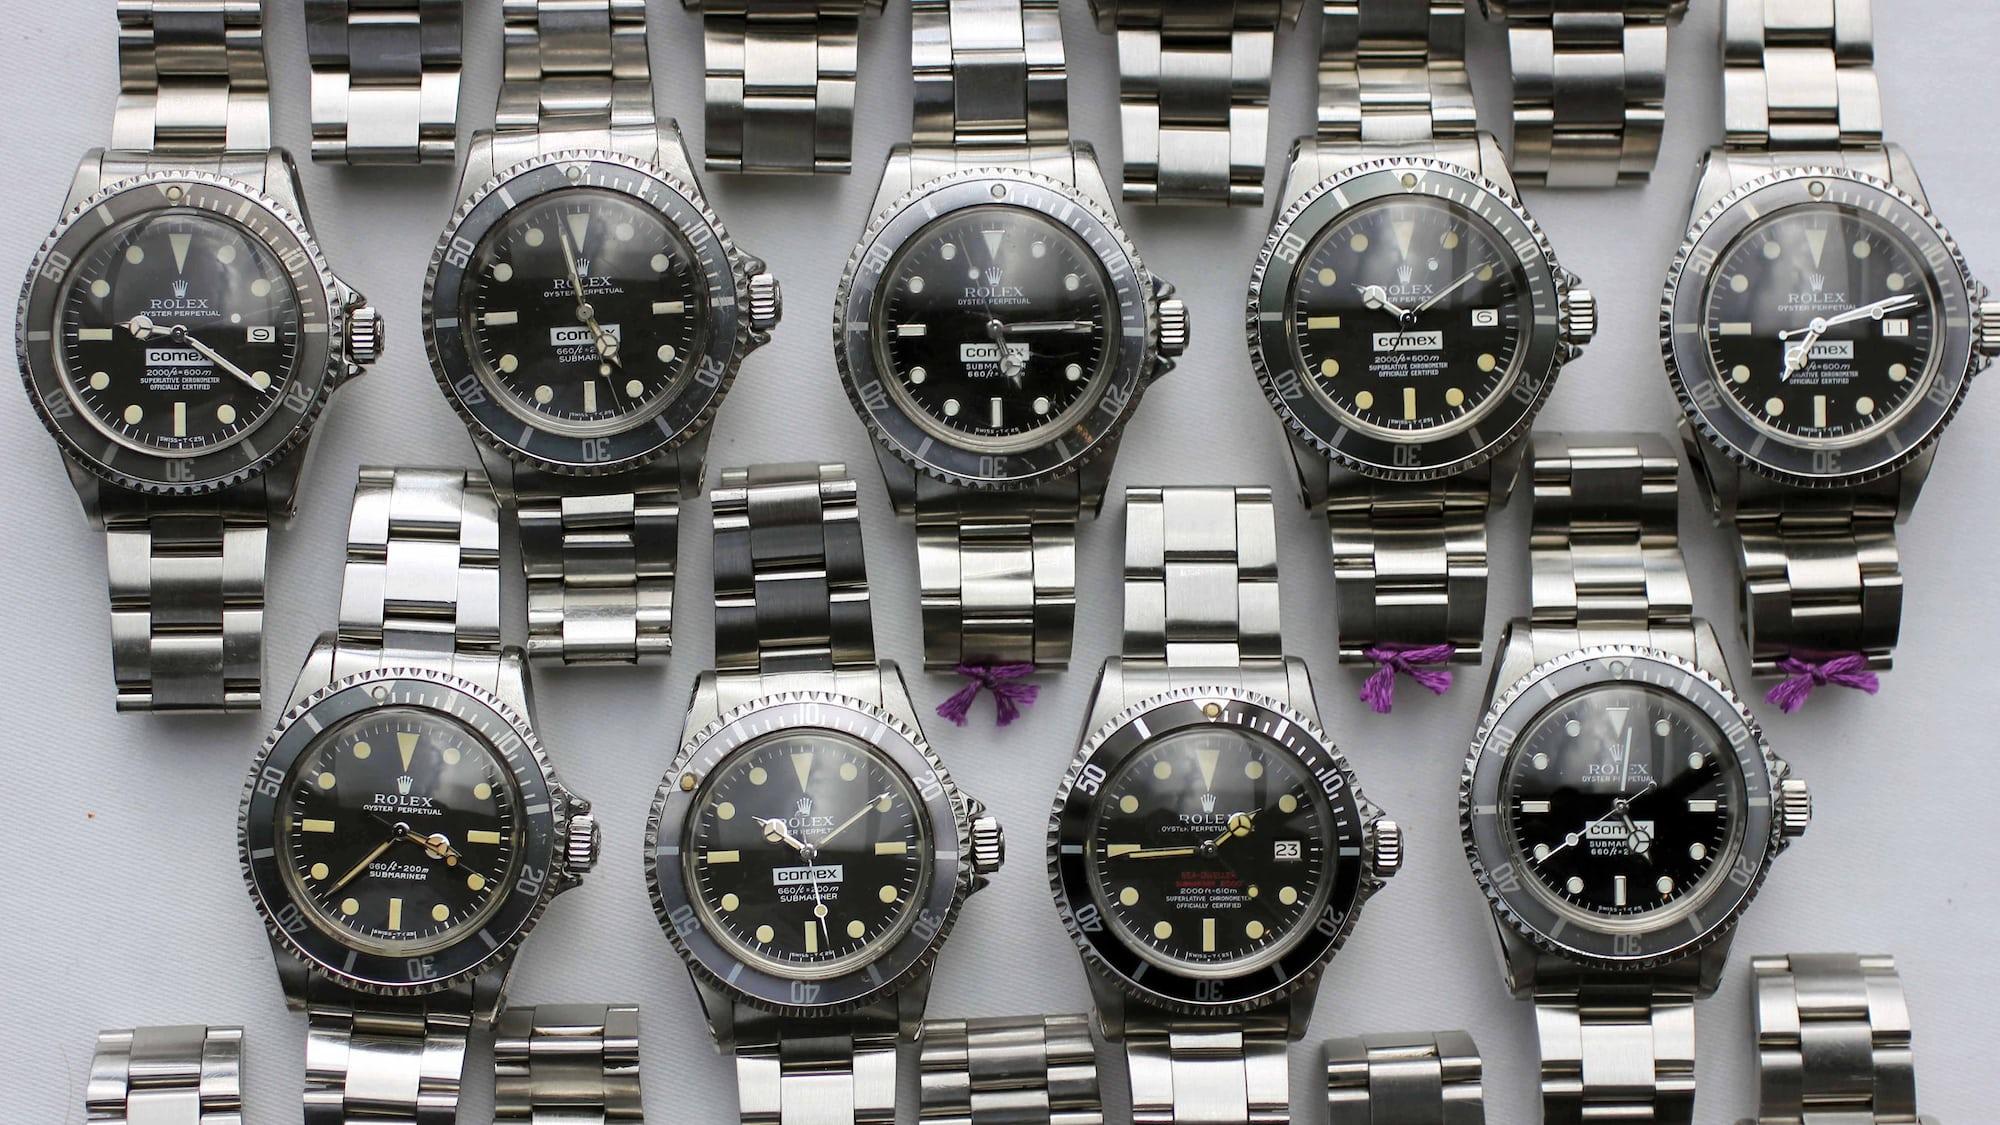 Ambiance img 0686.jpg?ixlib=rails 1.1 Just Because: The Plural Of Rolex Just Because: The Plural Of Rolex AMBIANCE IMG 0686